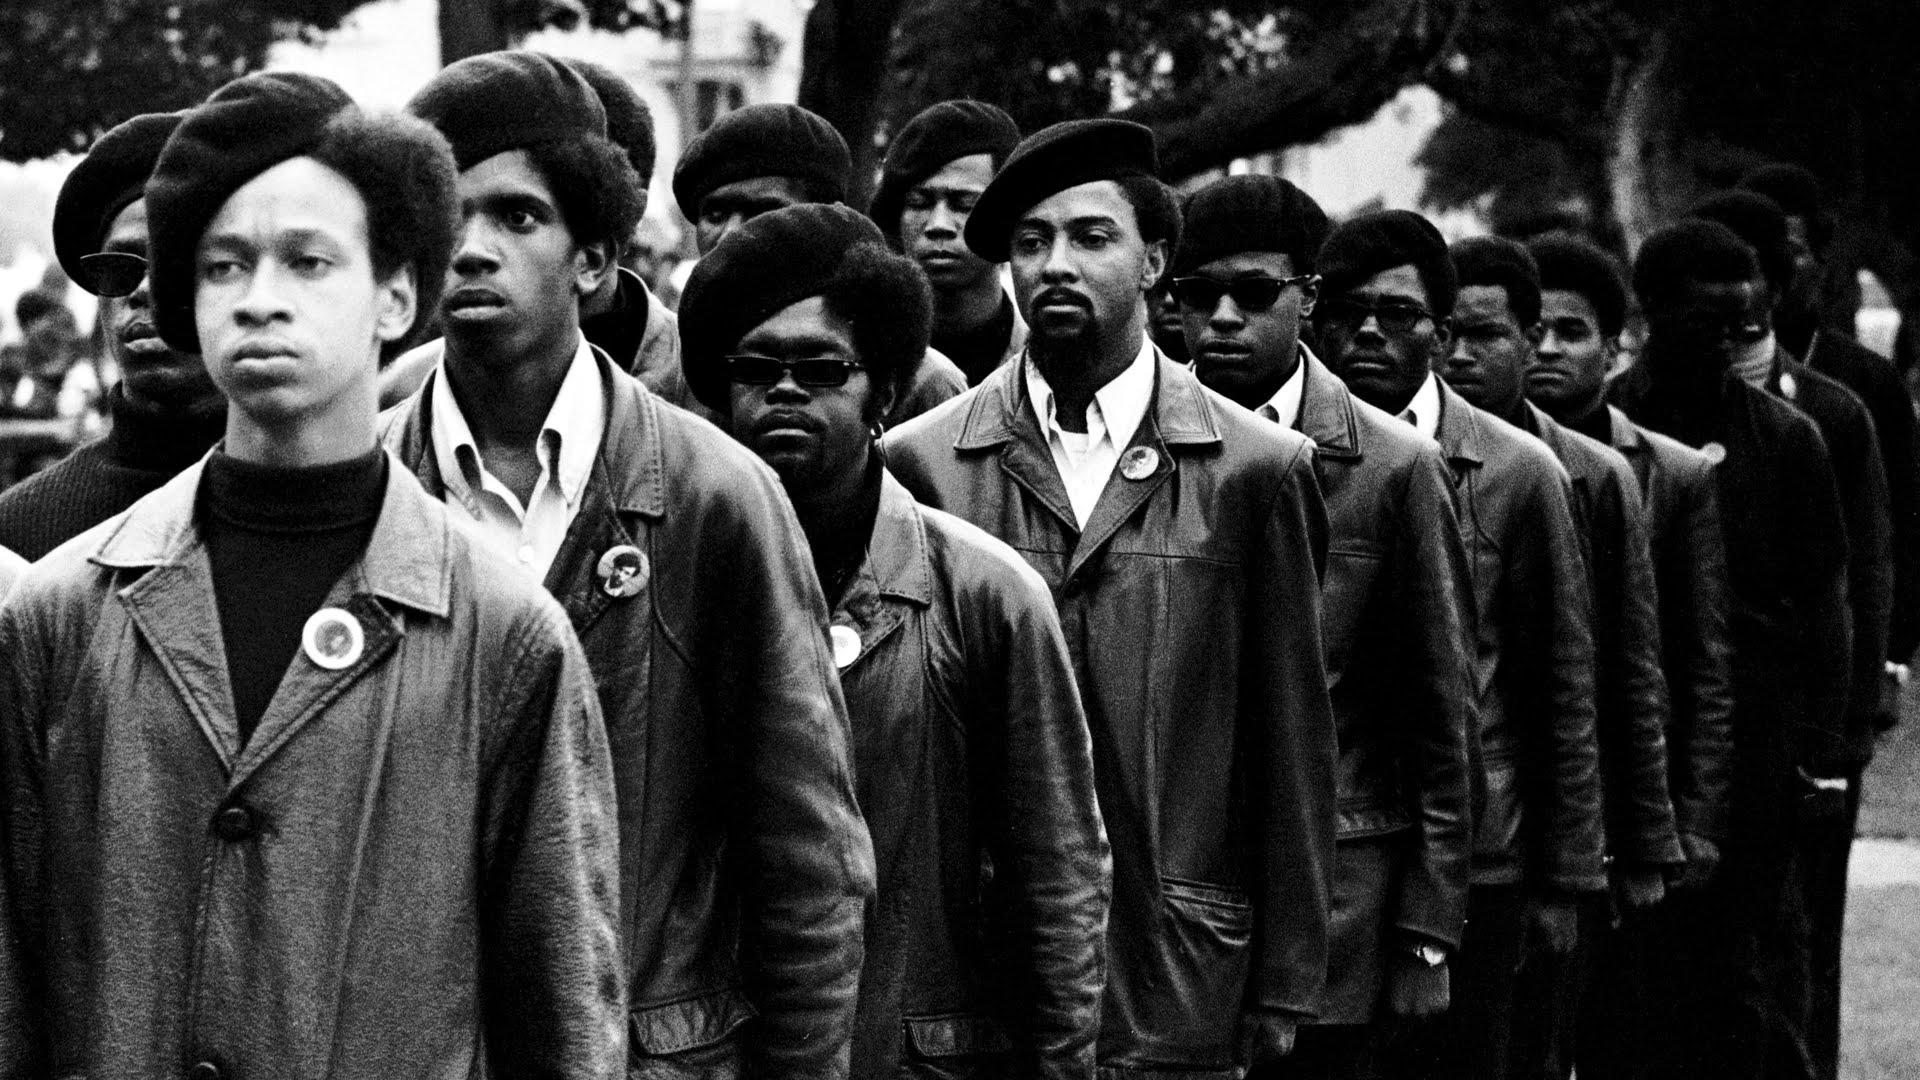 VEN 21 APR – Documentari al CISIM: Black panthers: vanguard of the revolution